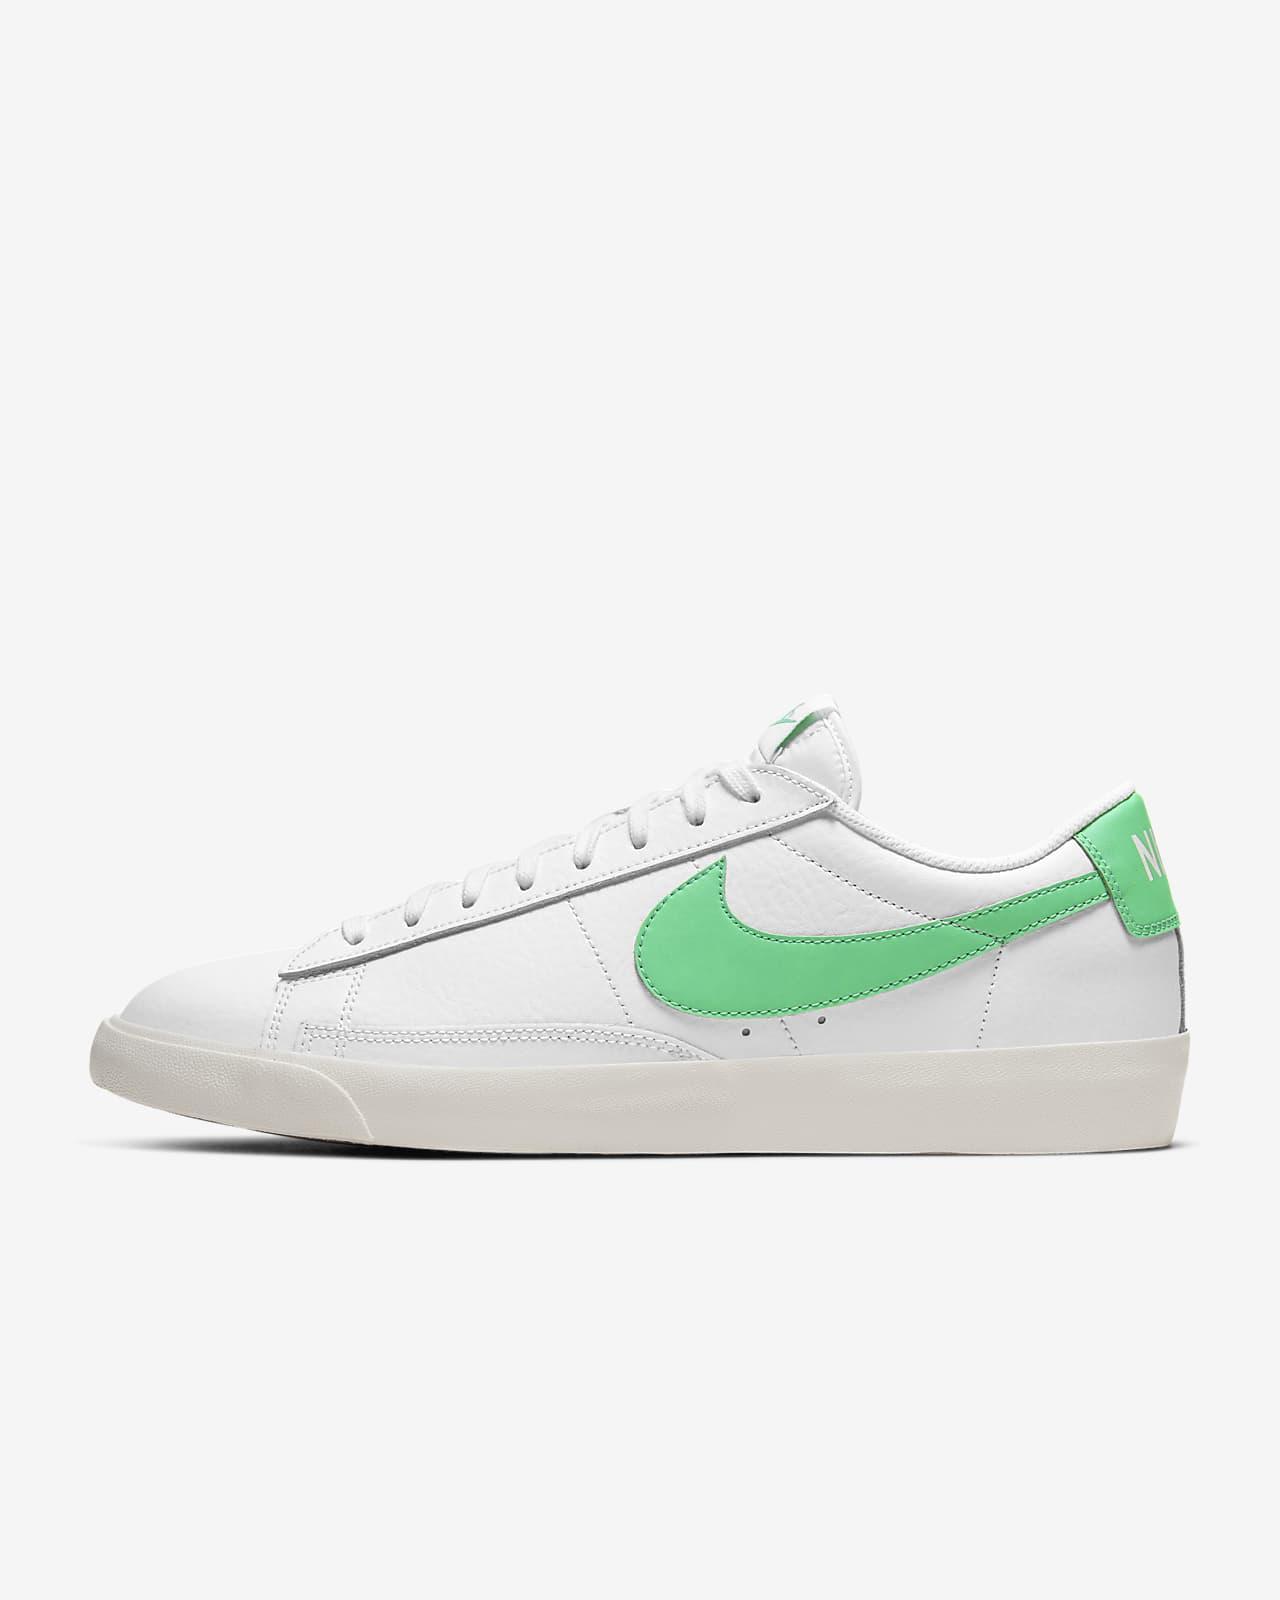 Nike Blazer Low Leather Men's Shoe. Nike LU